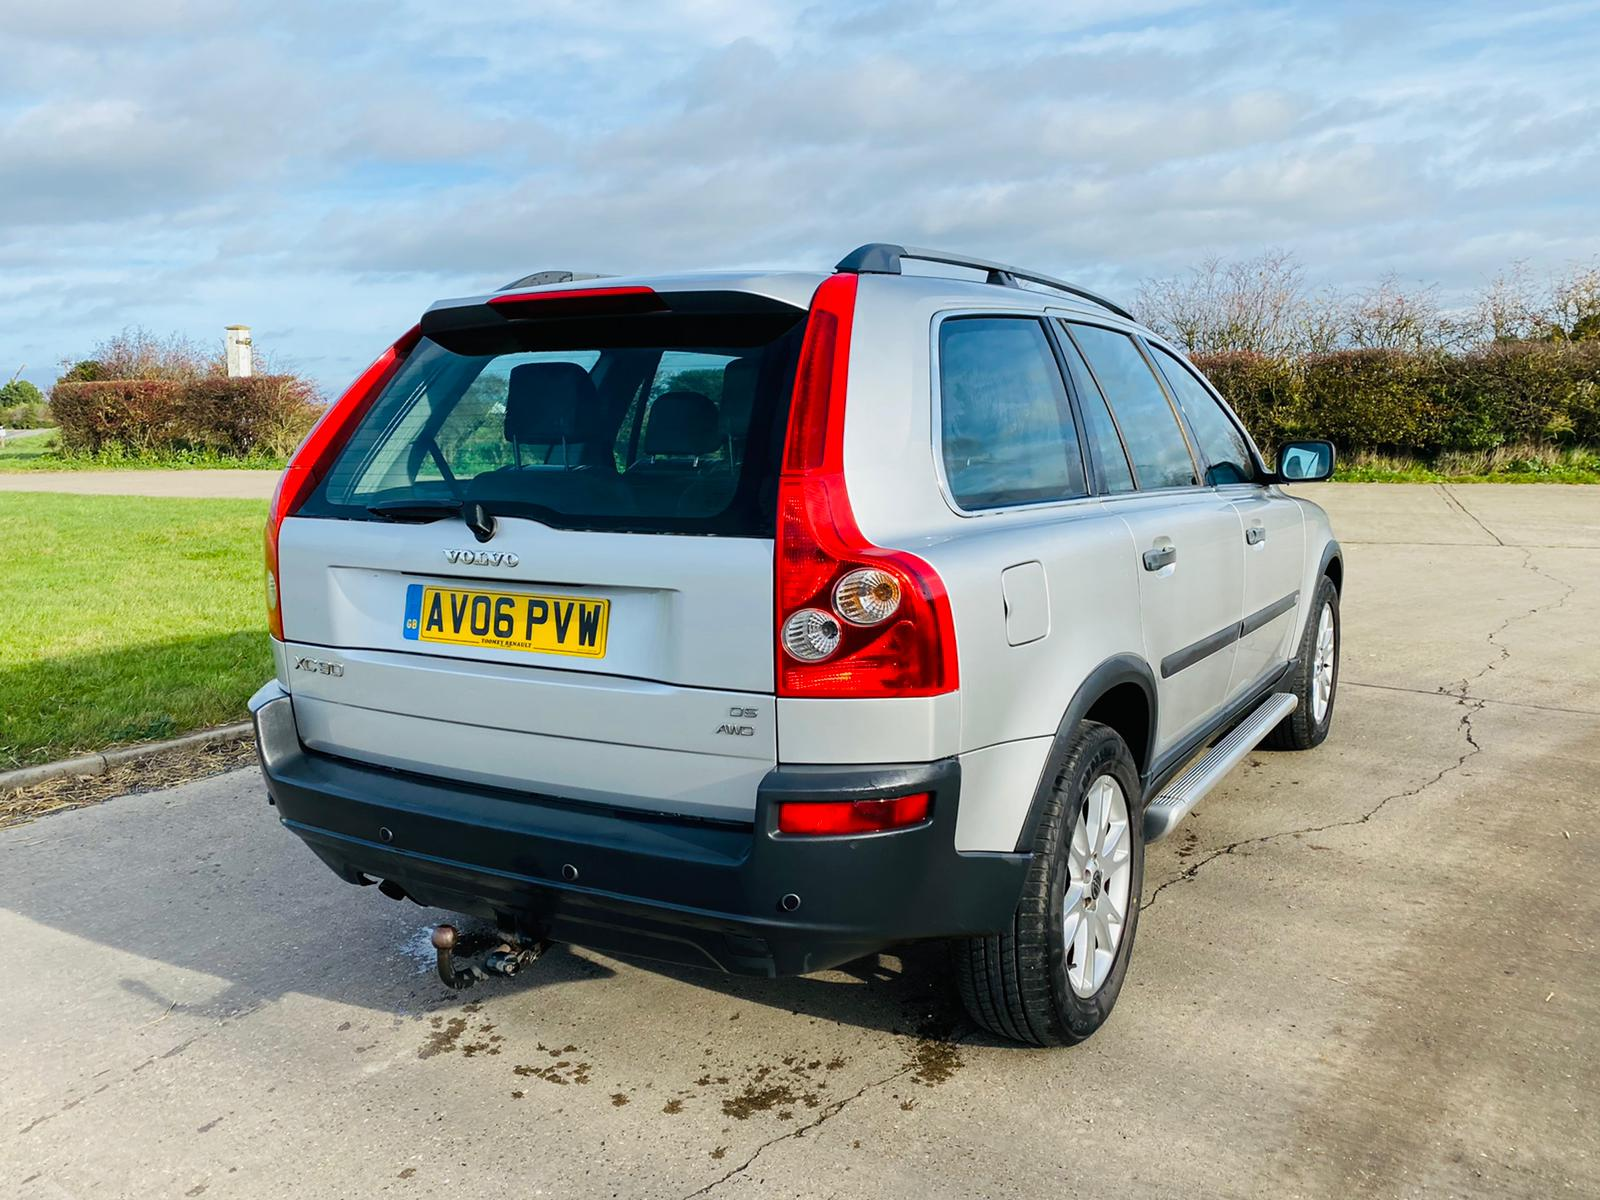 Volvo XC90 2.4 D5 185bhp SE Geartronic Auto 2006 06 Reg - 7 Seats - Air con - Top Spec - Image 9 of 47